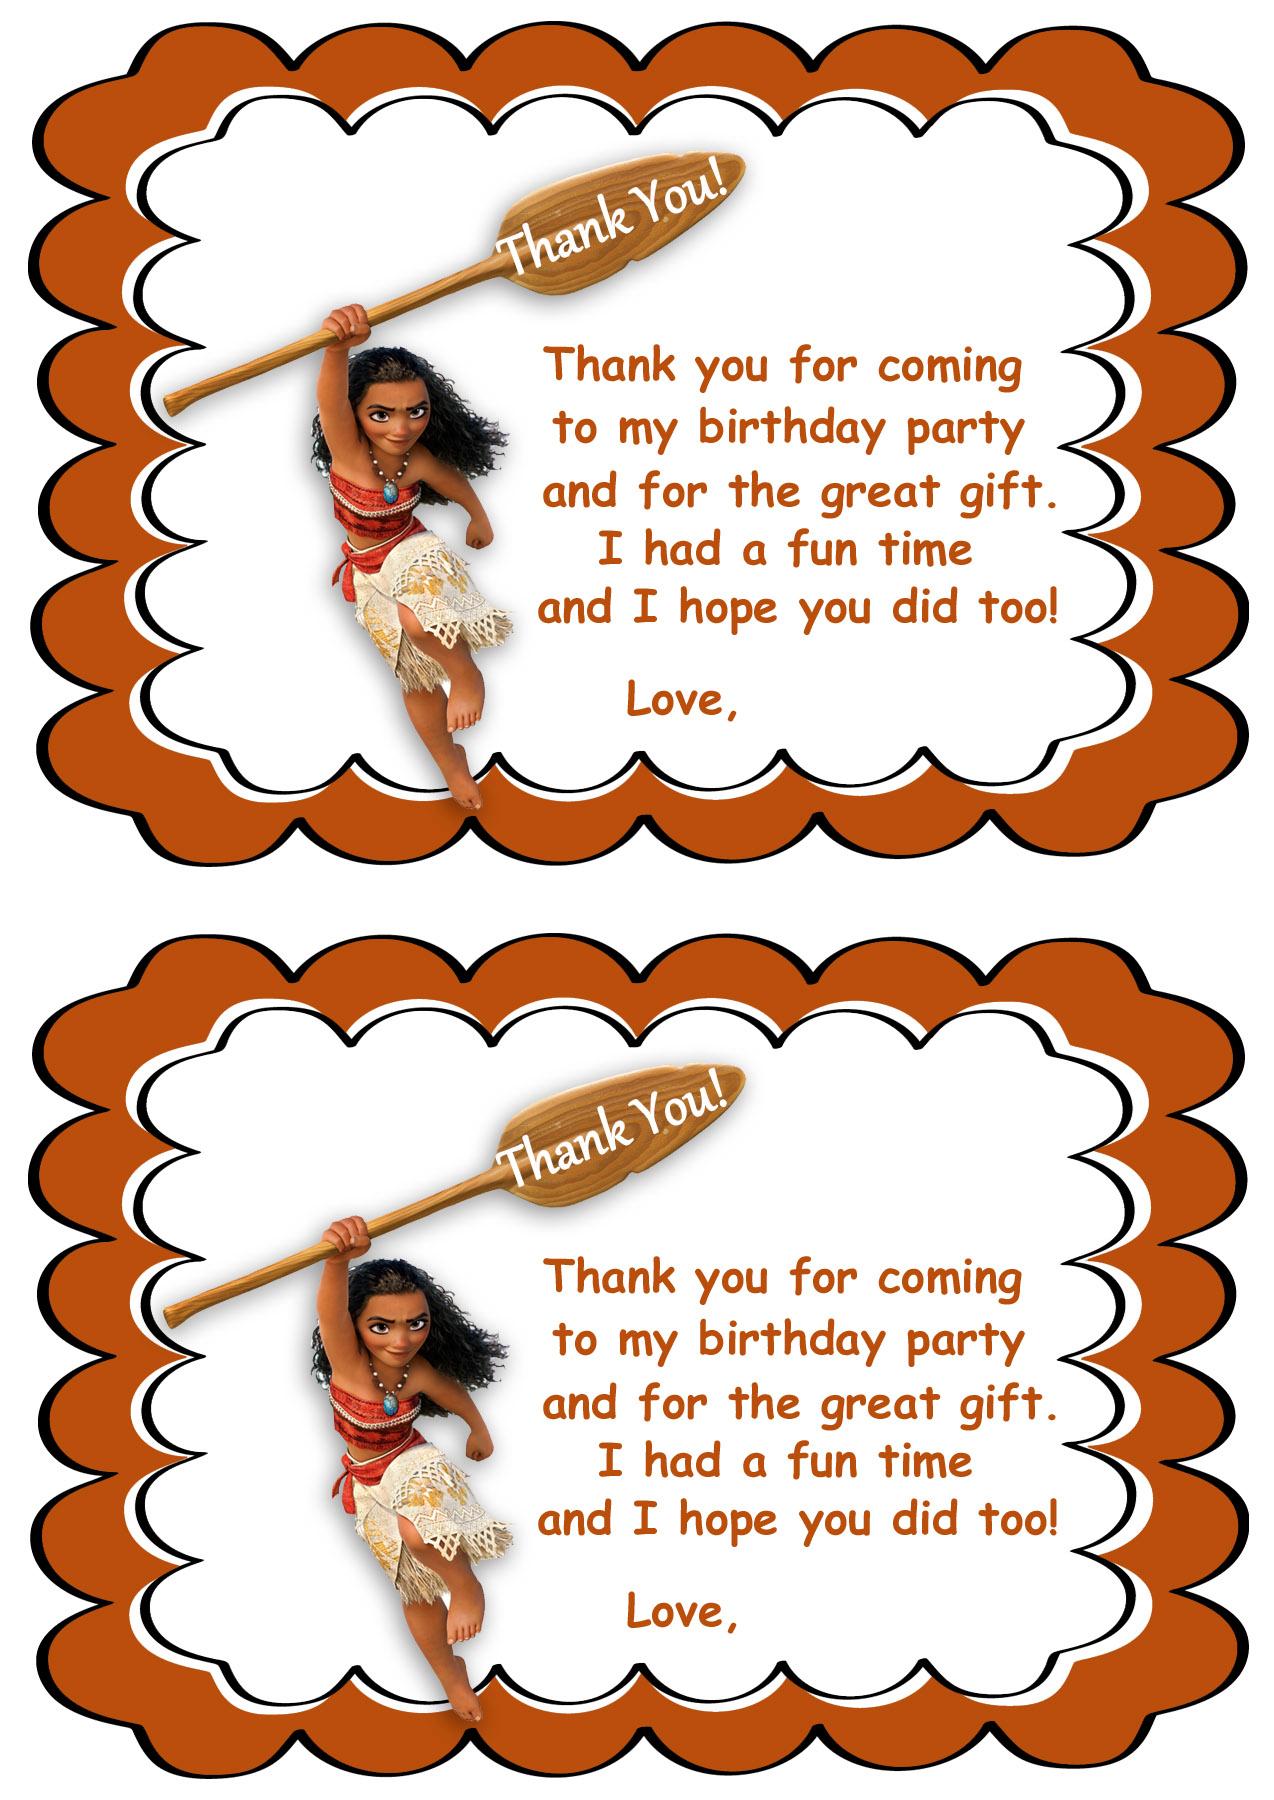 Moana Thank You Cards | Birthday Printable - Free Printable Thank You Tags For Birthdays